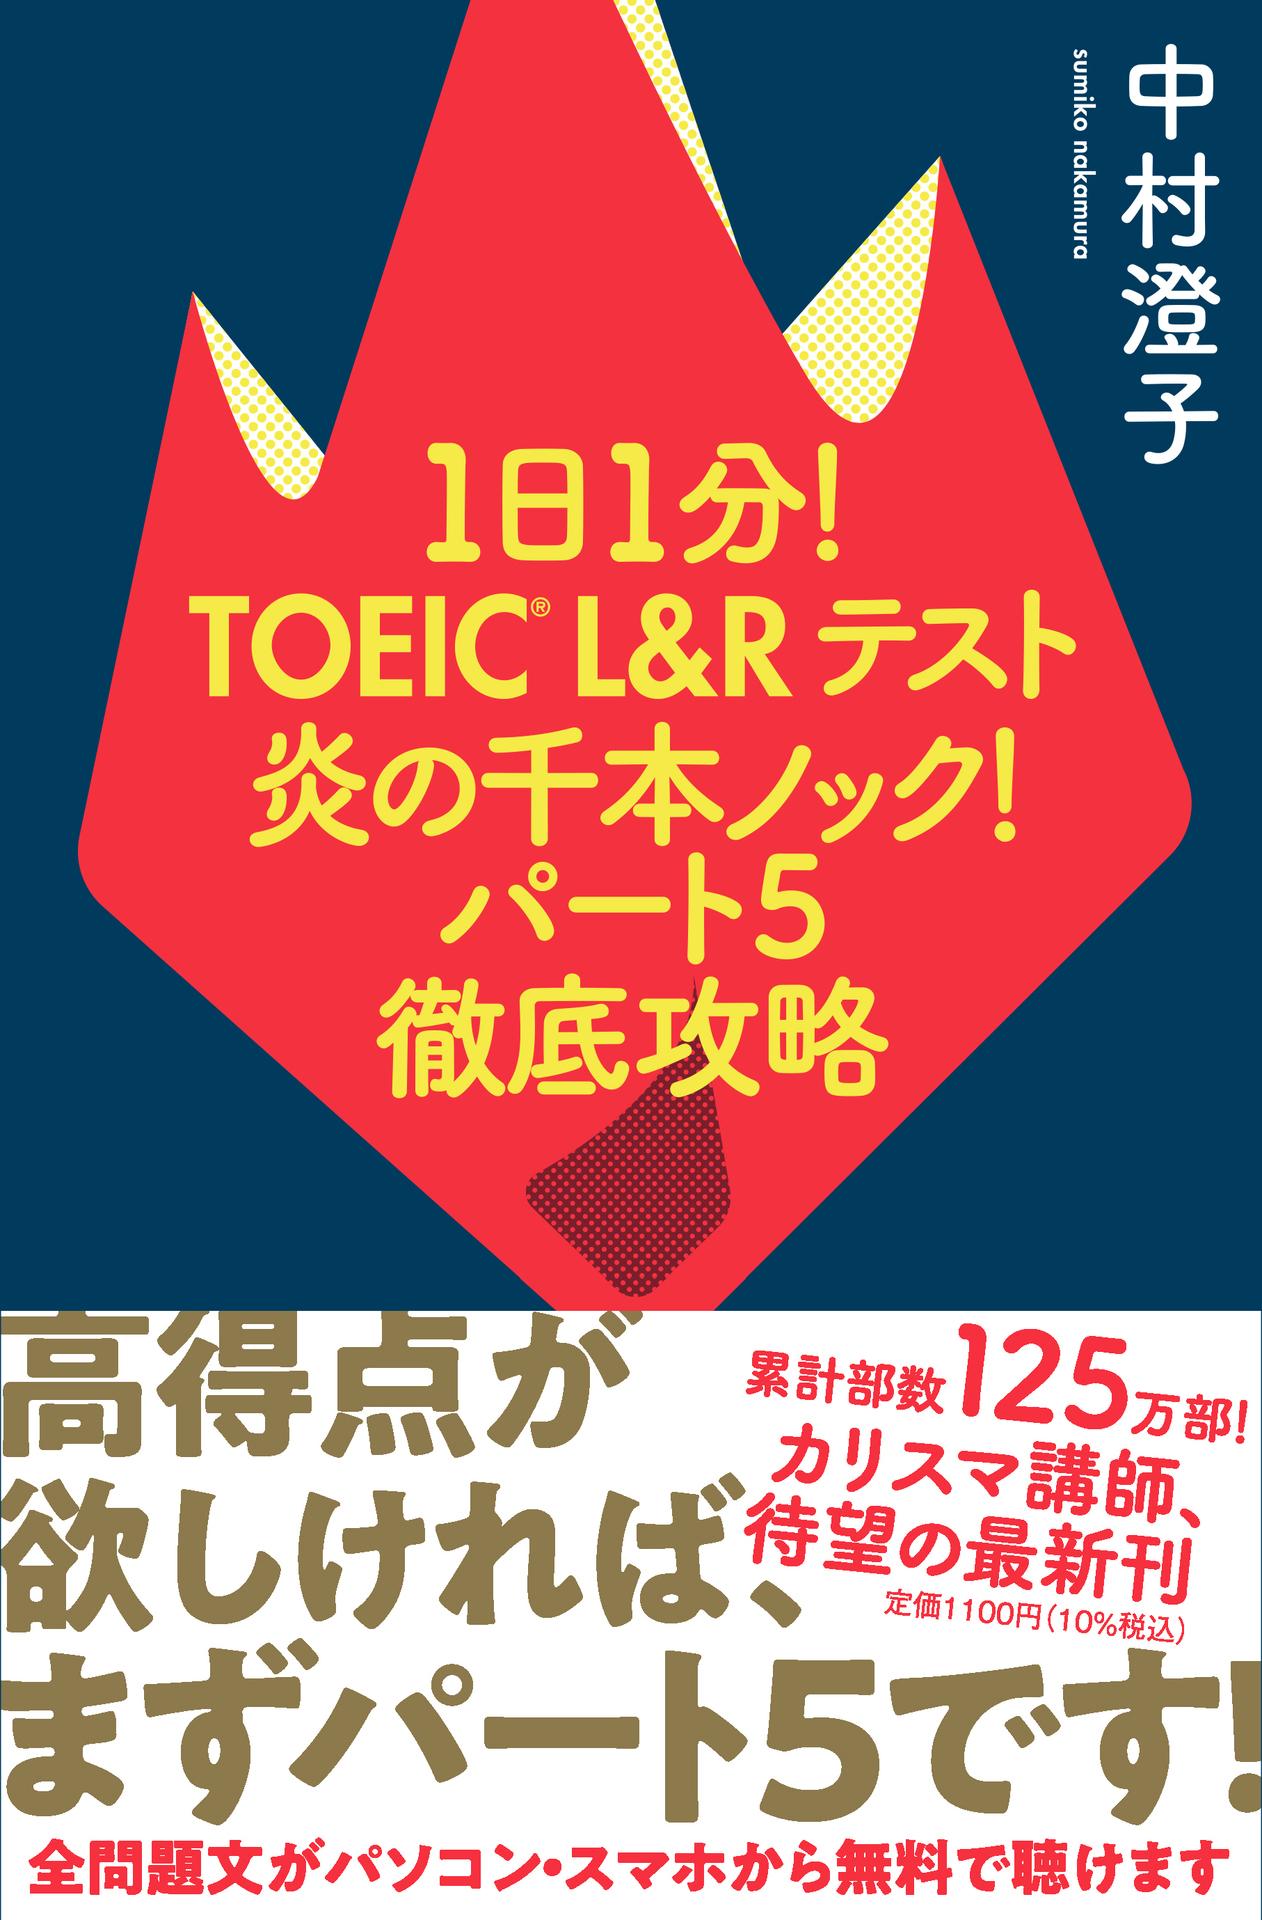 「TOEIC炎の千本ノックパート5」書影-1.jpg